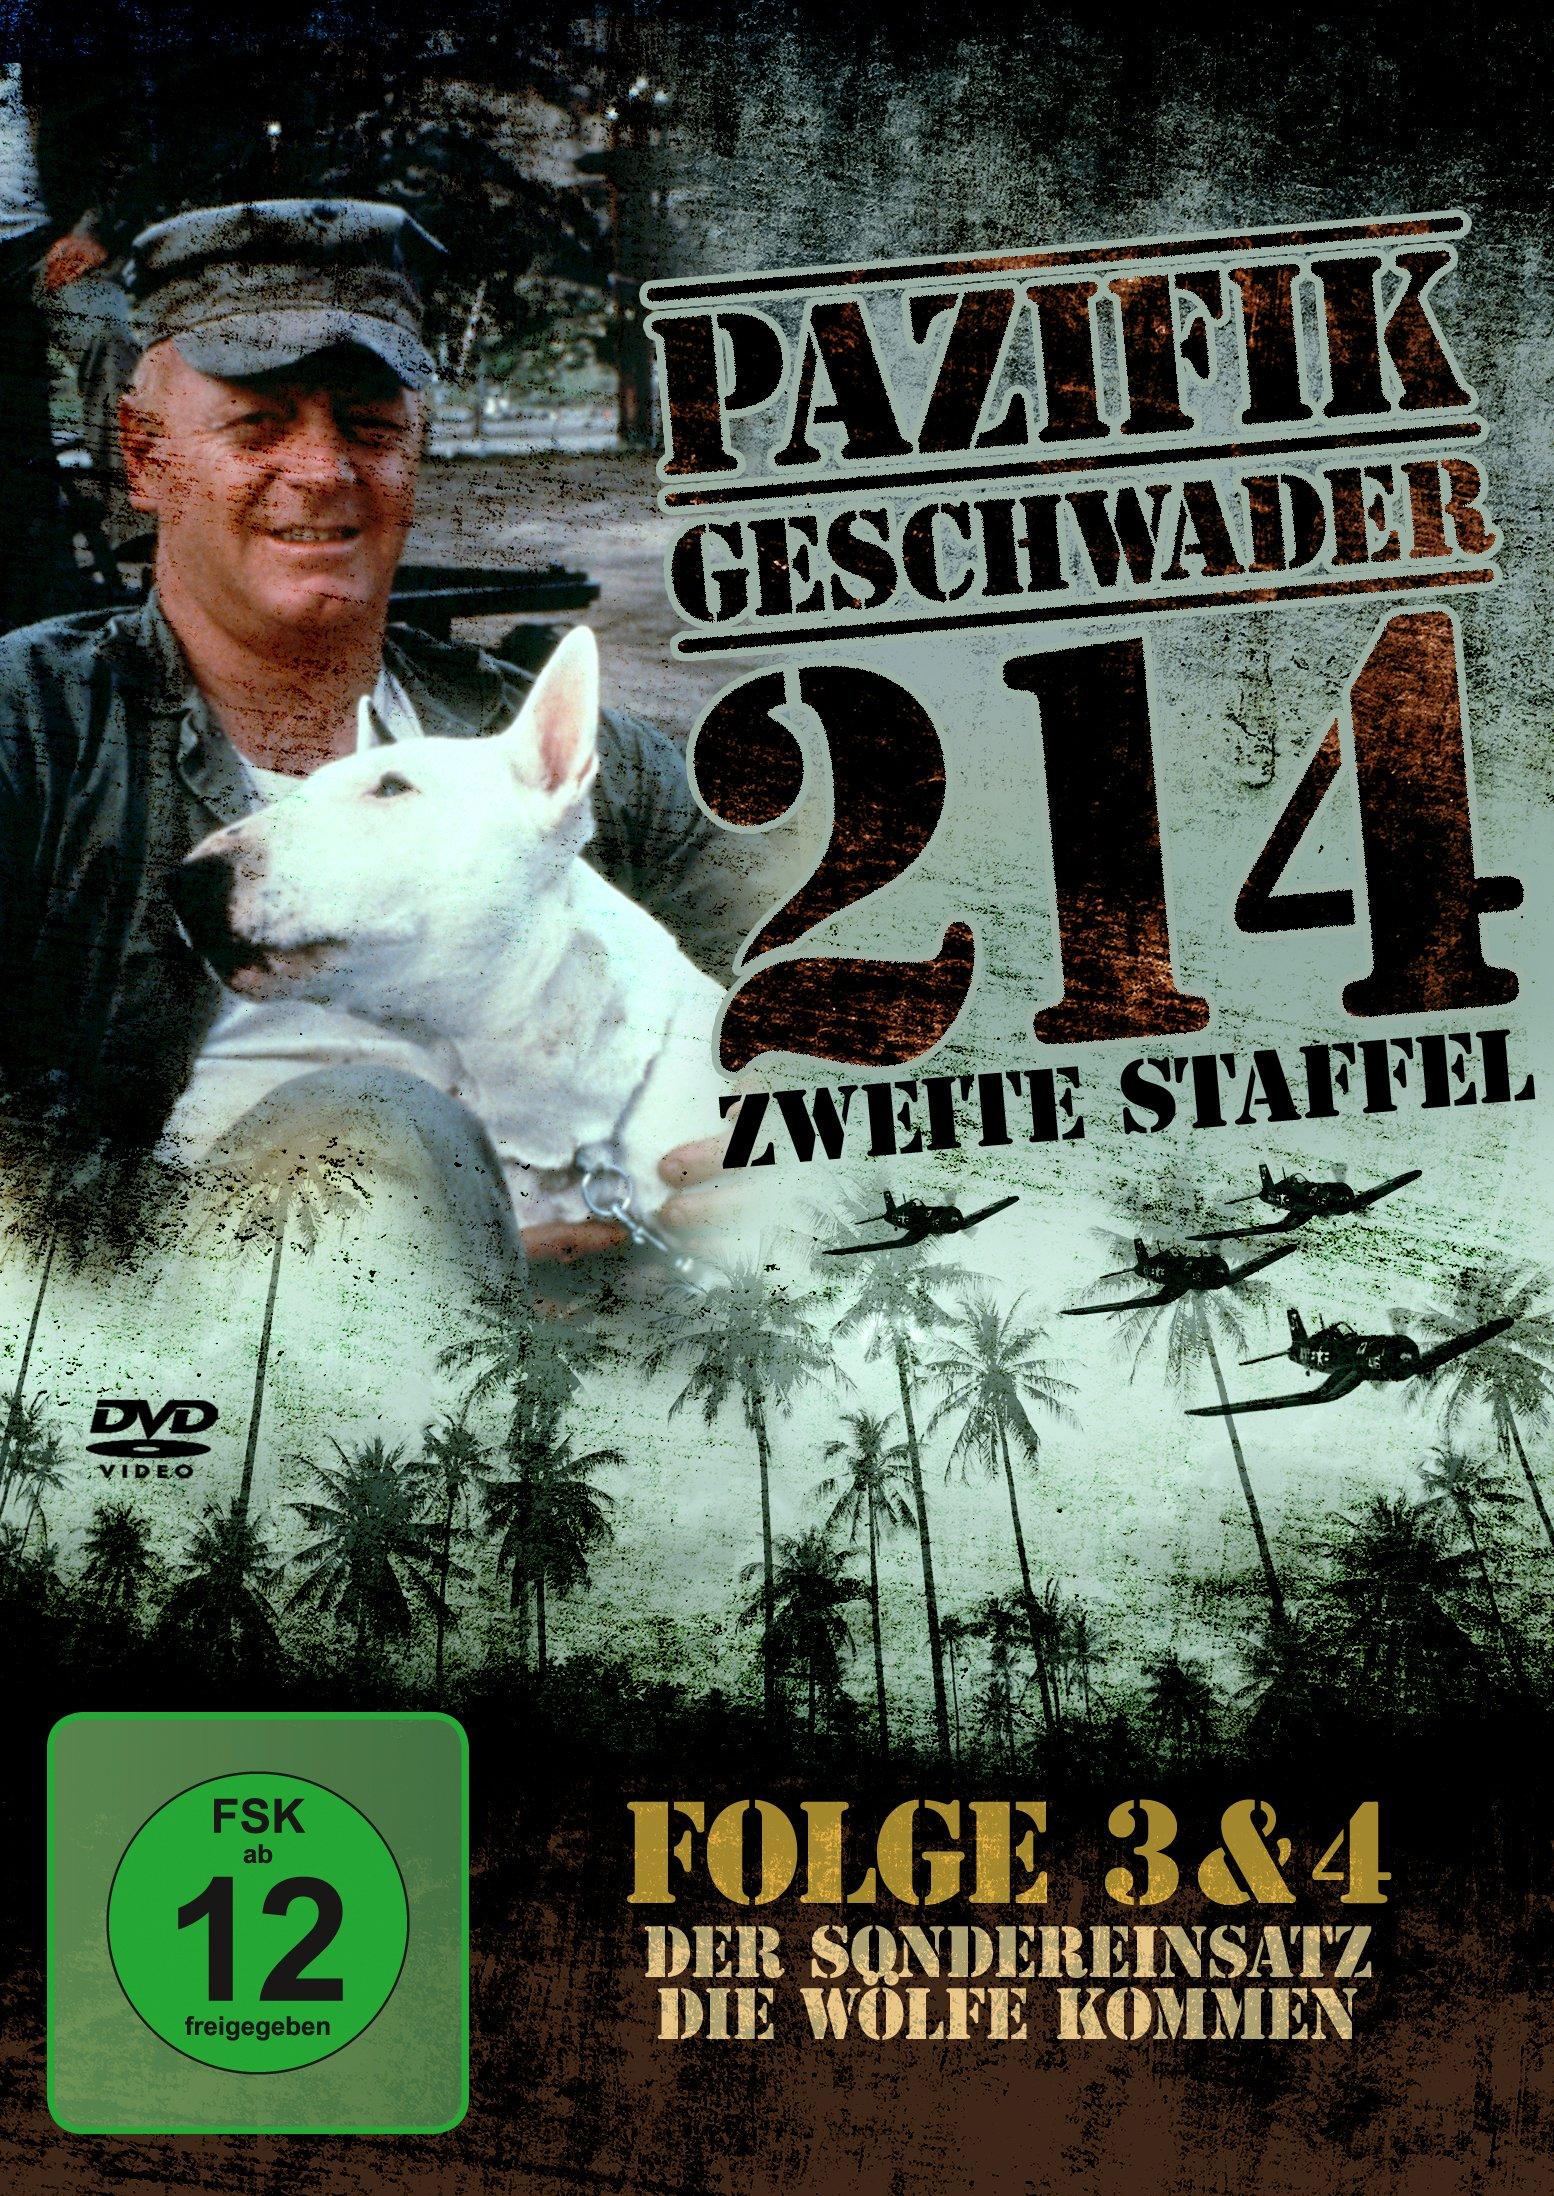 DVD : 2.STAFFEL FOLGE 3 & 4 DER SONDE - 2.staffel Folge 3 & 4: Der Sonde (NTSC Format)